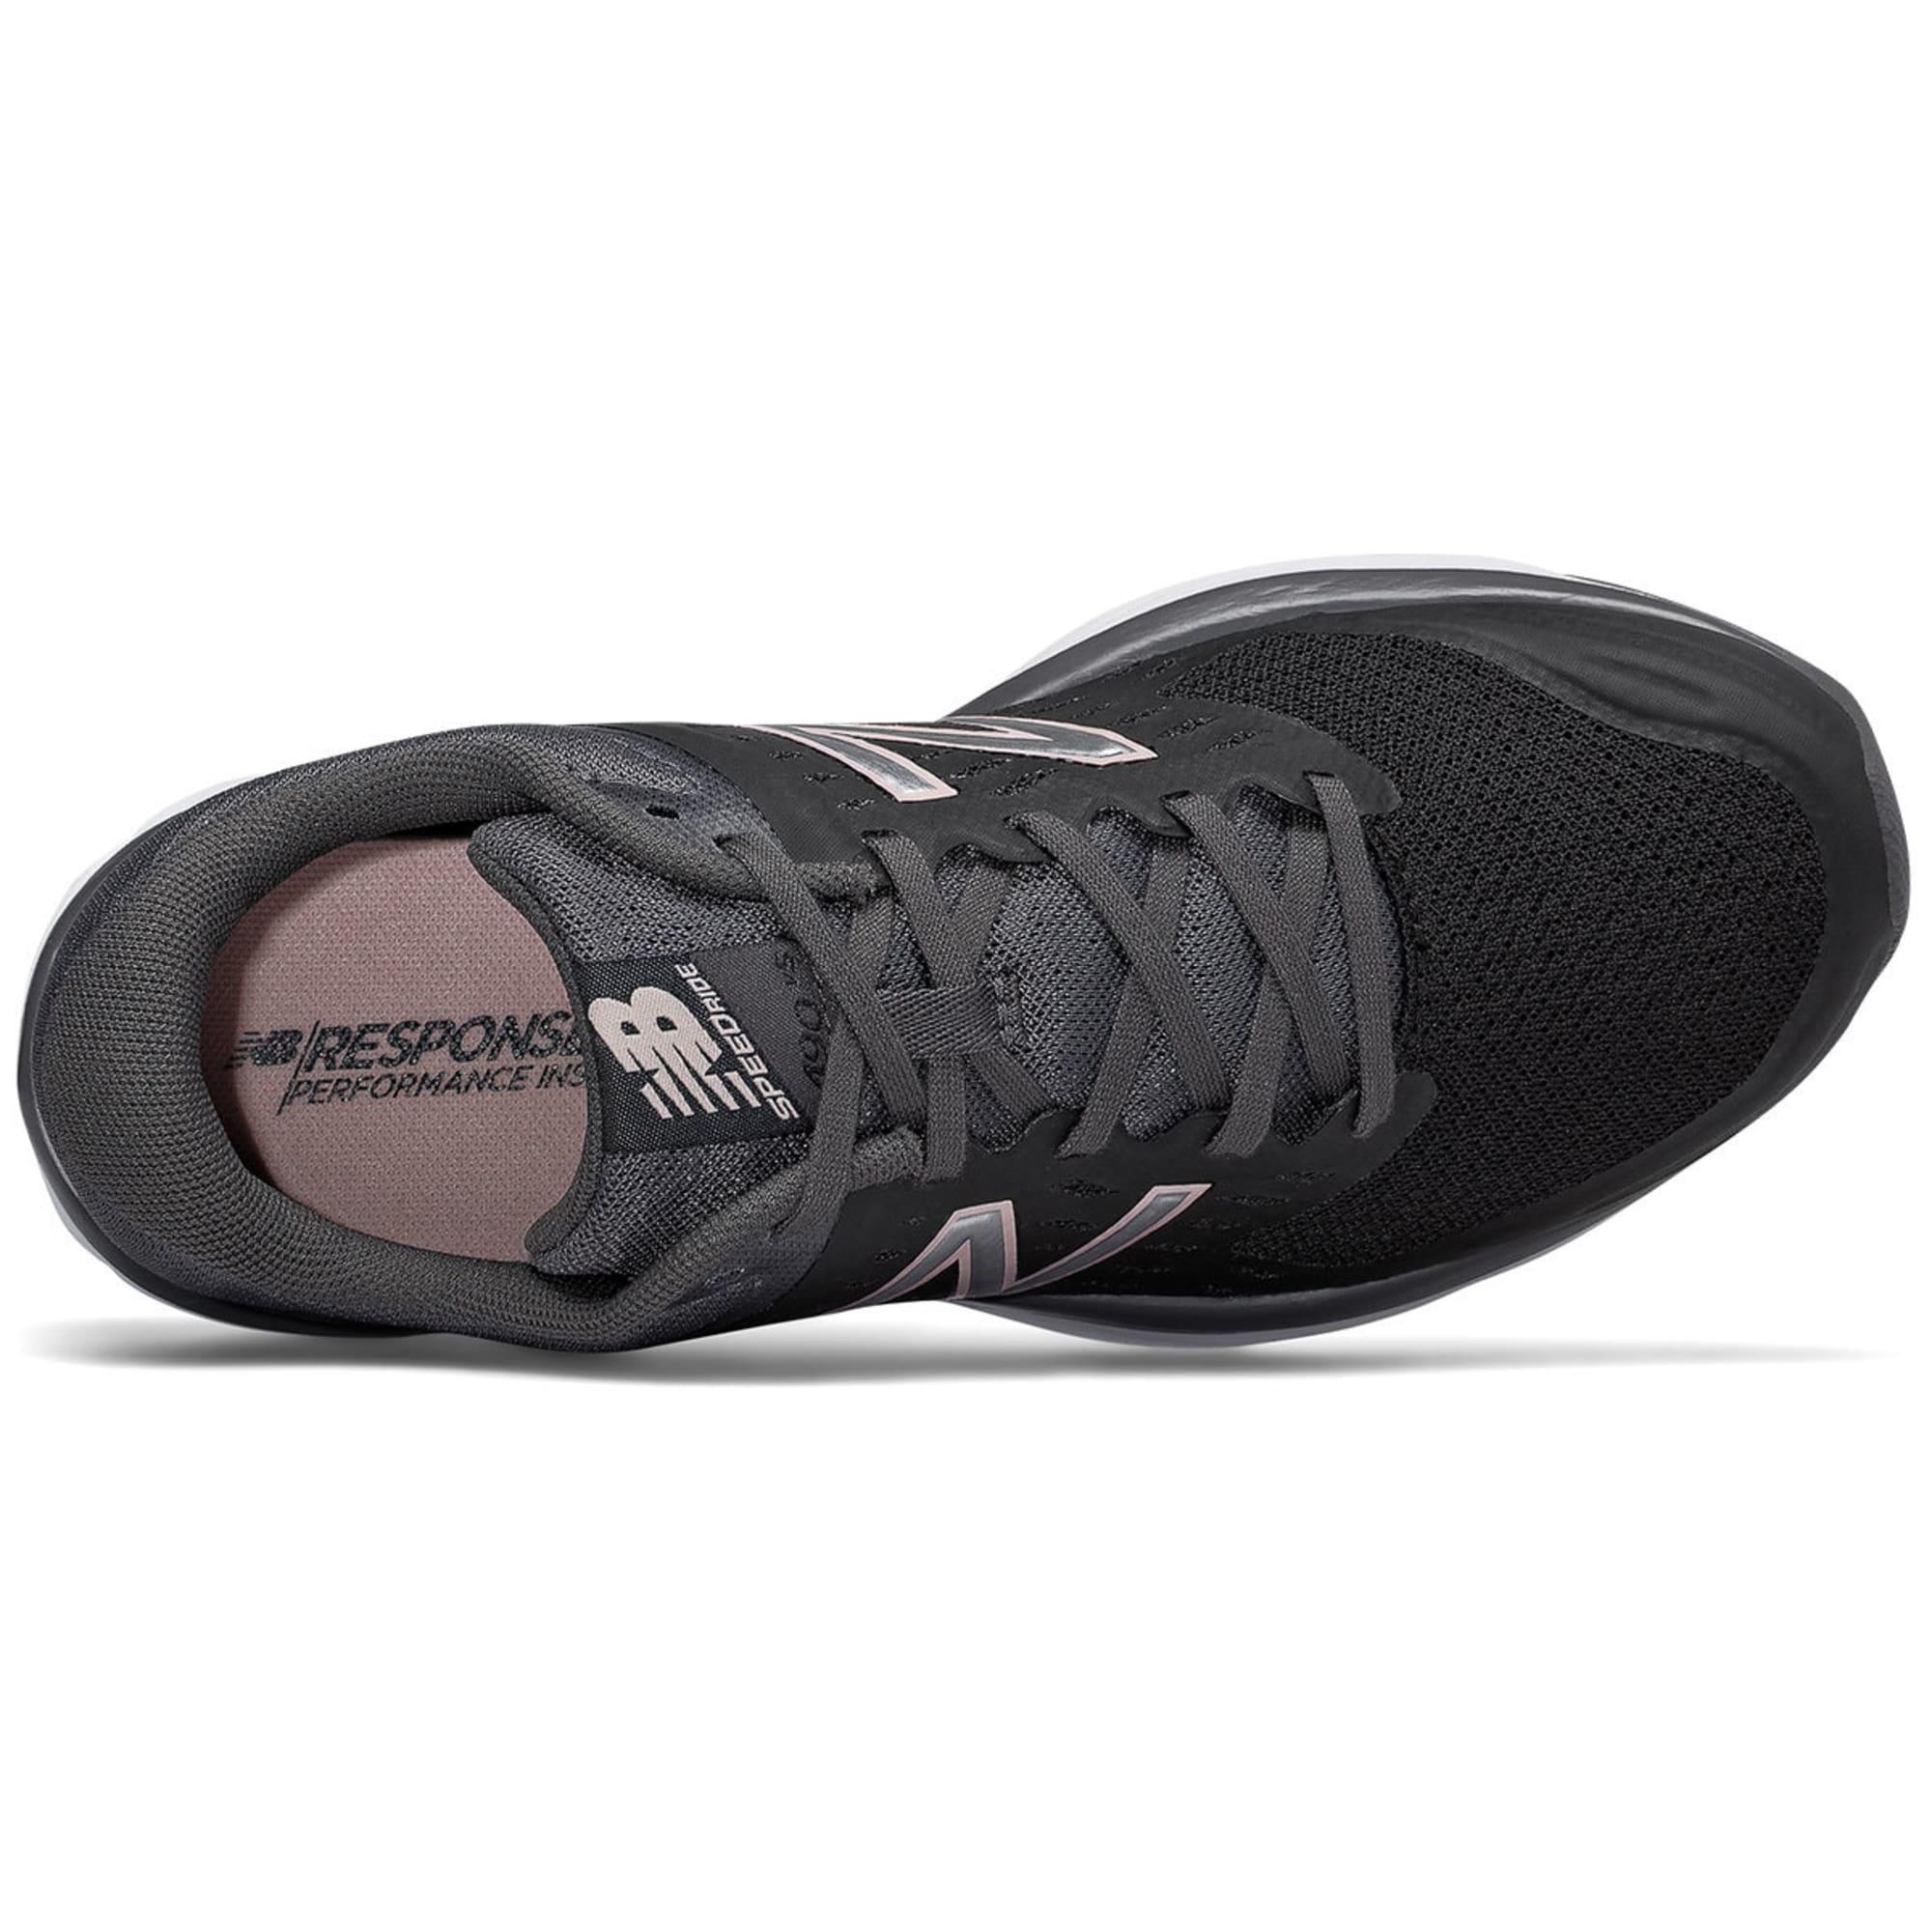 neue Produkte für 2019 echt offizieller Shop NEW BALANCE Women's 490v5 Running Shoes, Black/Magnet ...